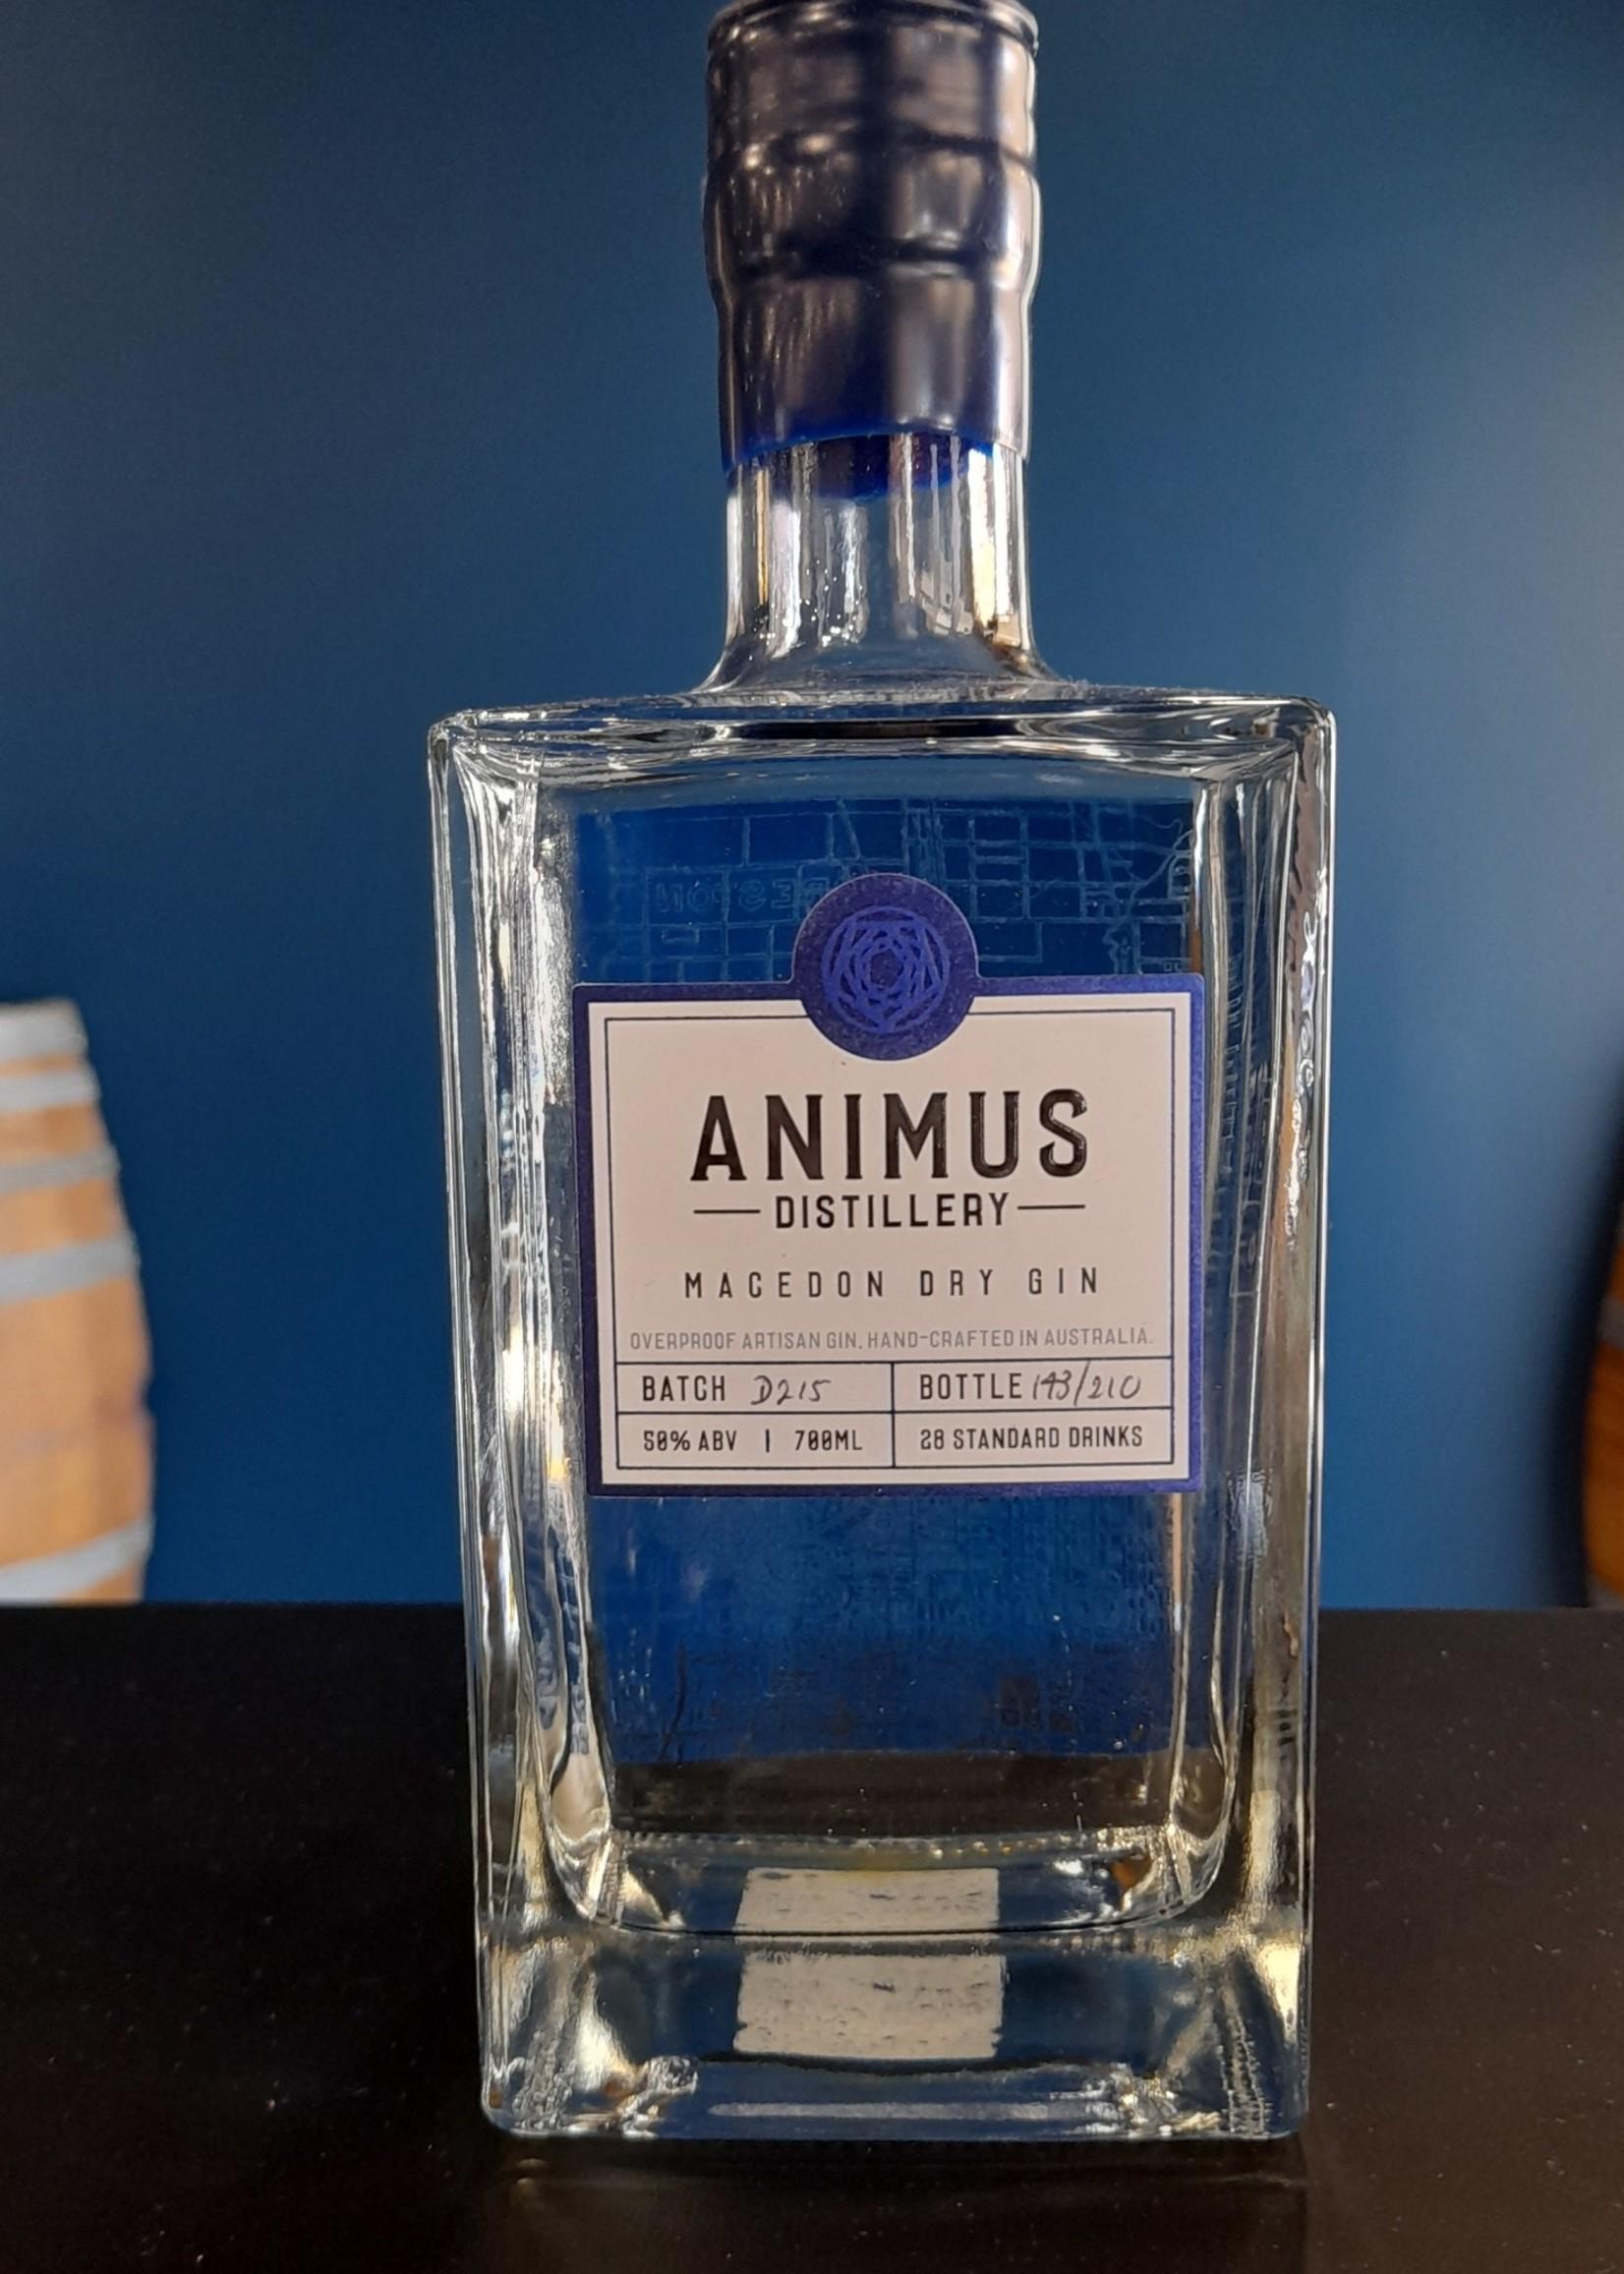 Animus Distillery Animus Distillery Macedon Dry Gin